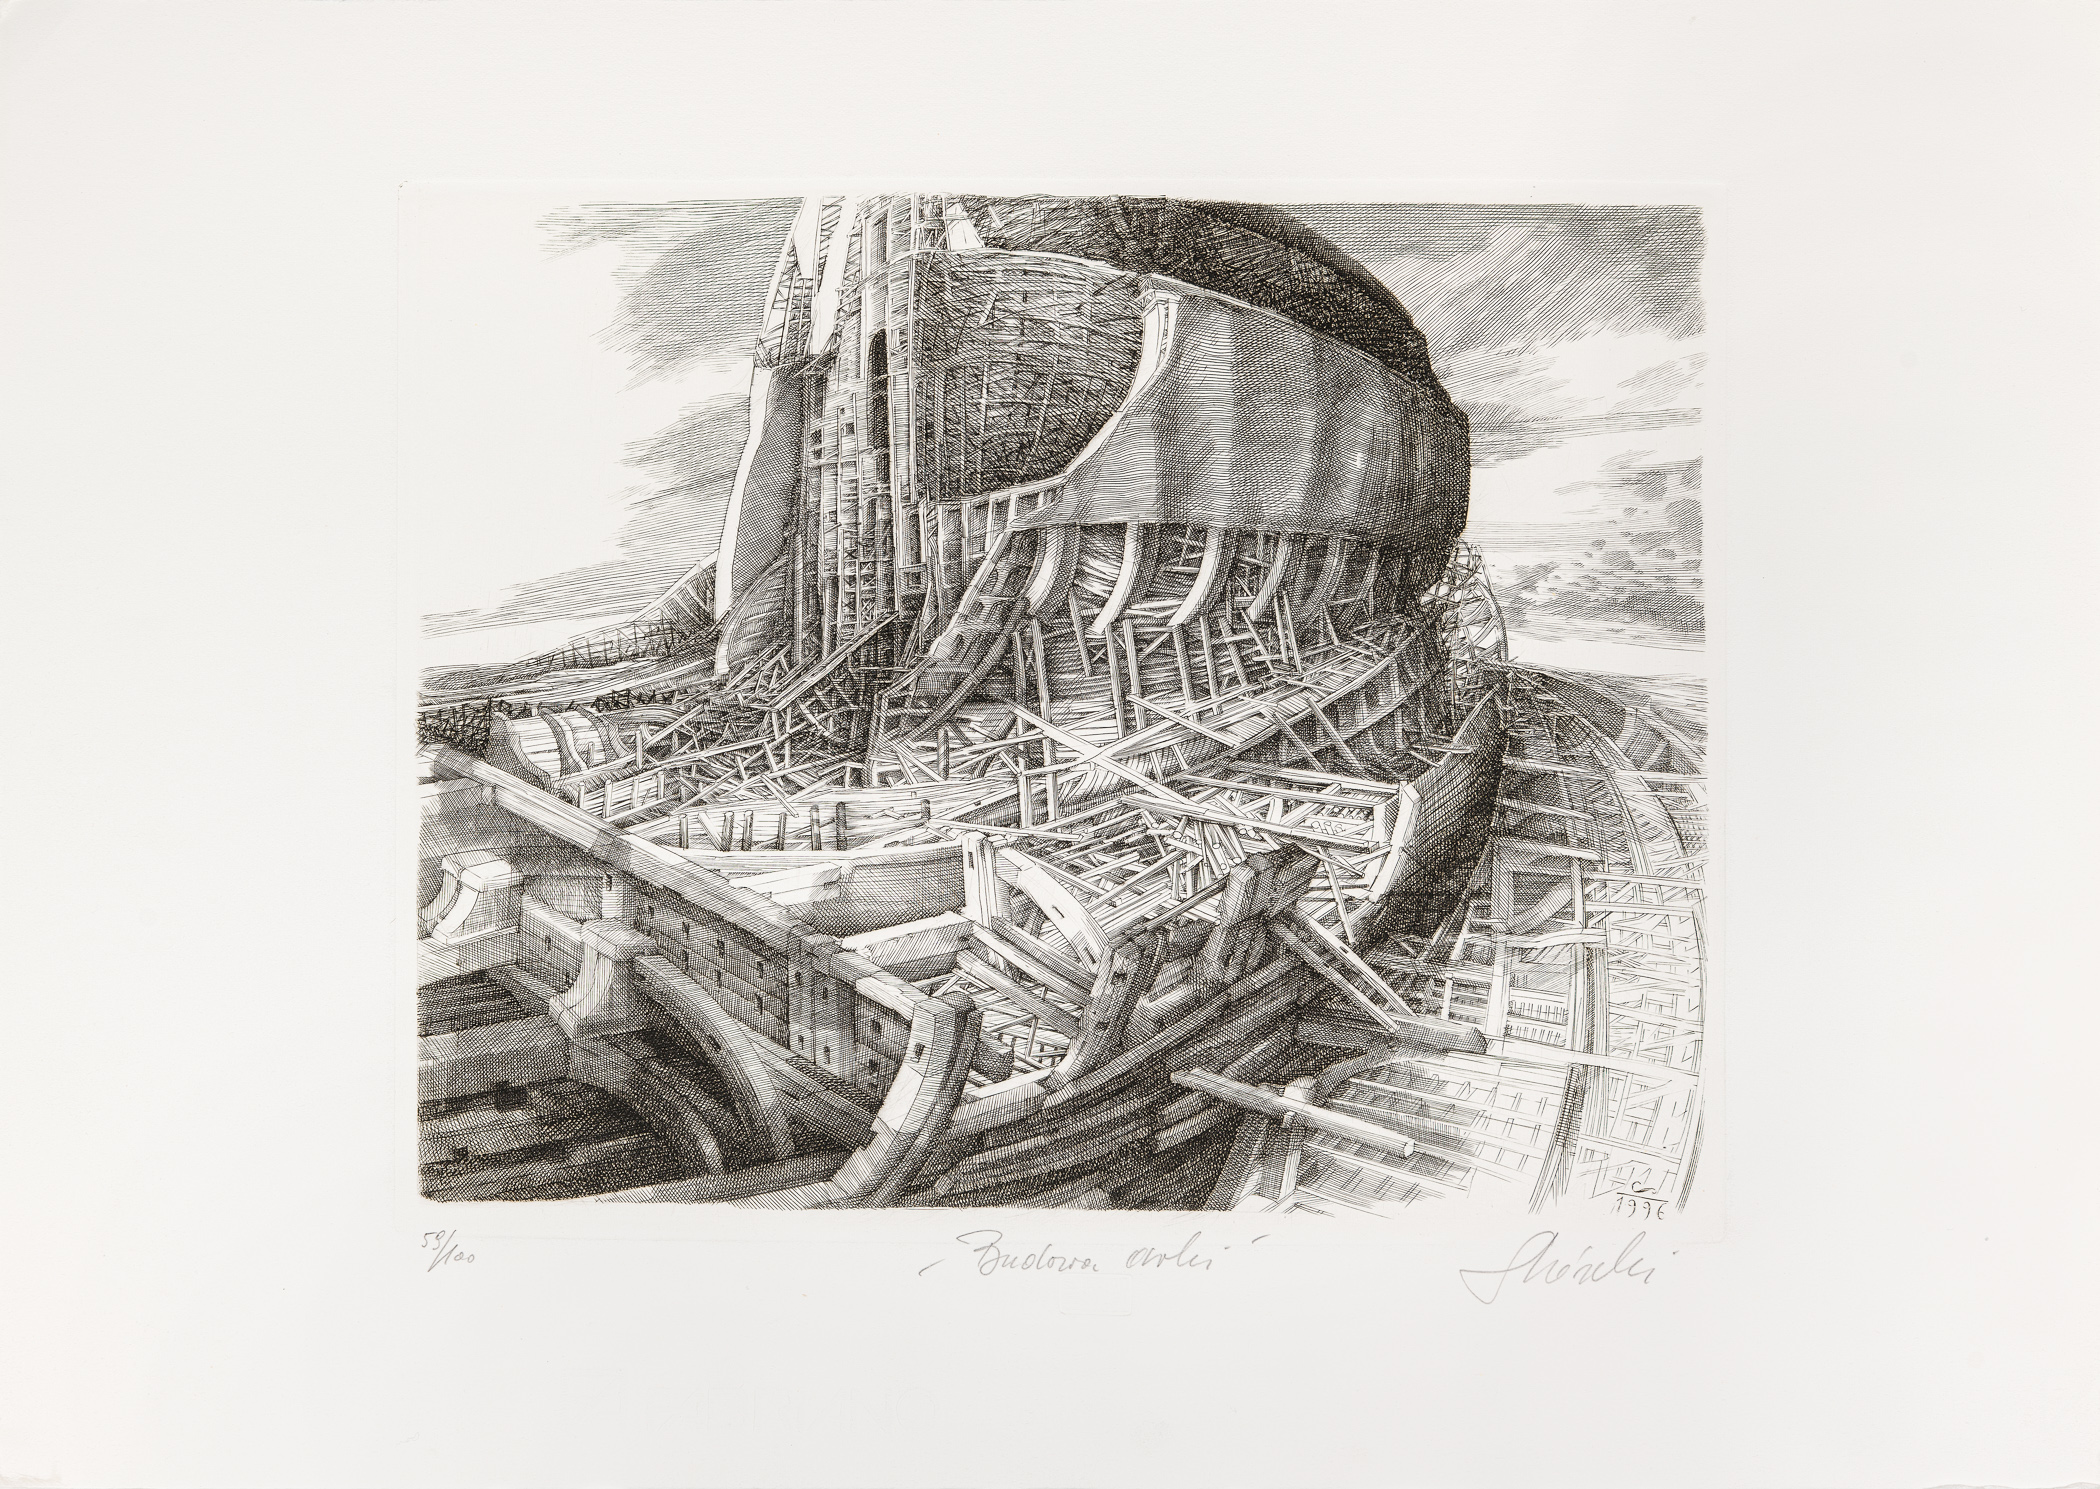 Budowa Arki, 1996